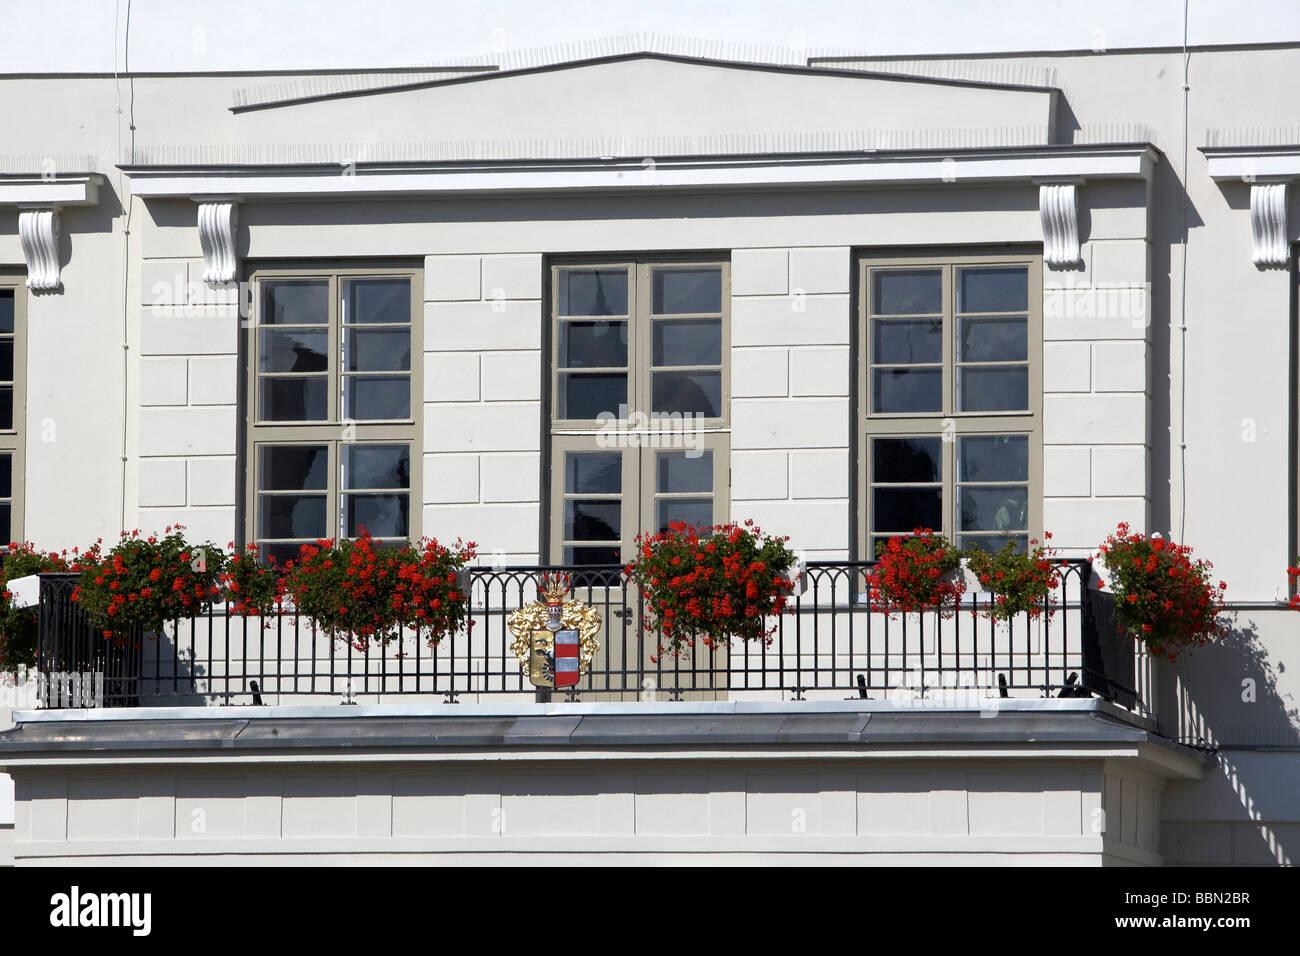 City hall, Wismar, Mecklenburg-Western Pomerania, Germany, Europe - Stock Image